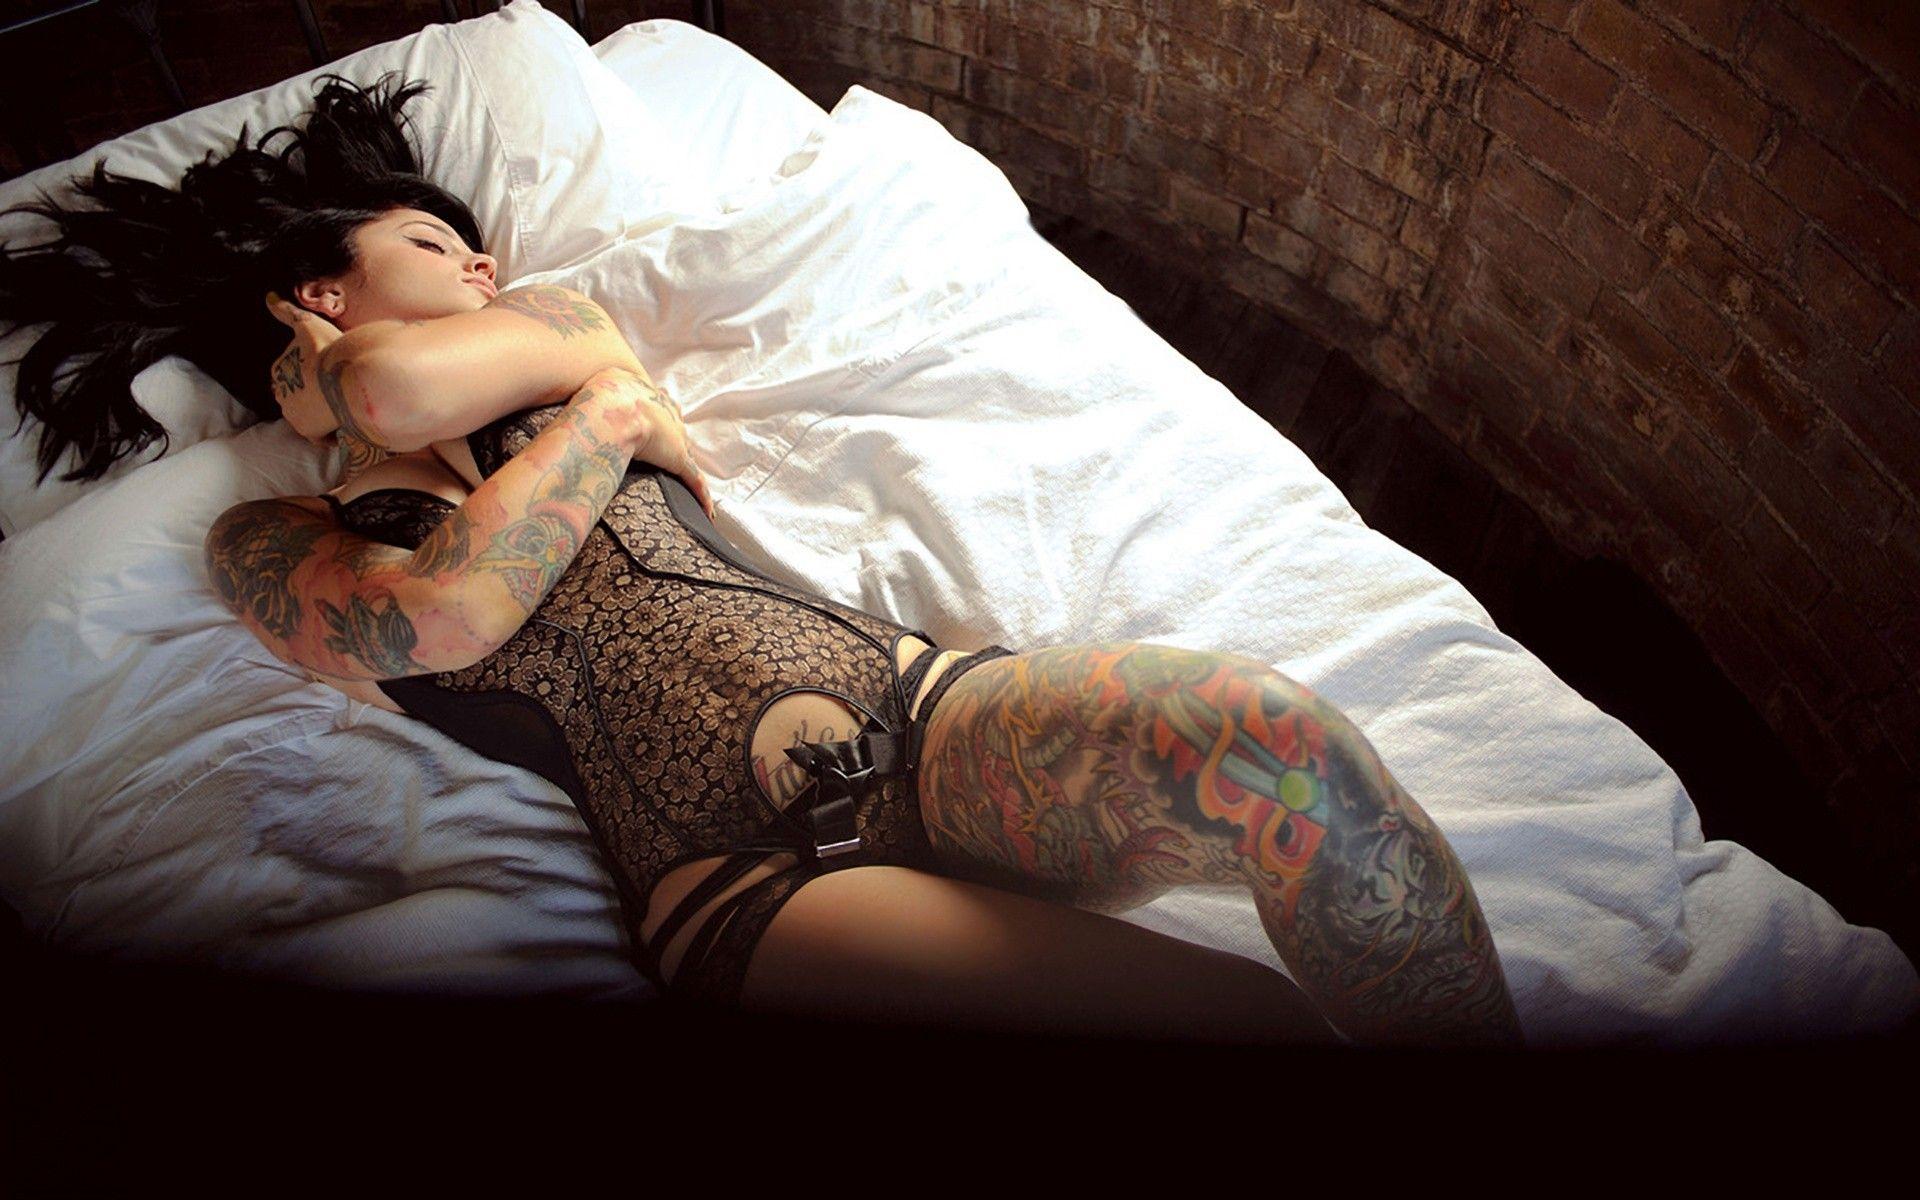 Girl brunette lingerie tattoo hot beauty nice sexy